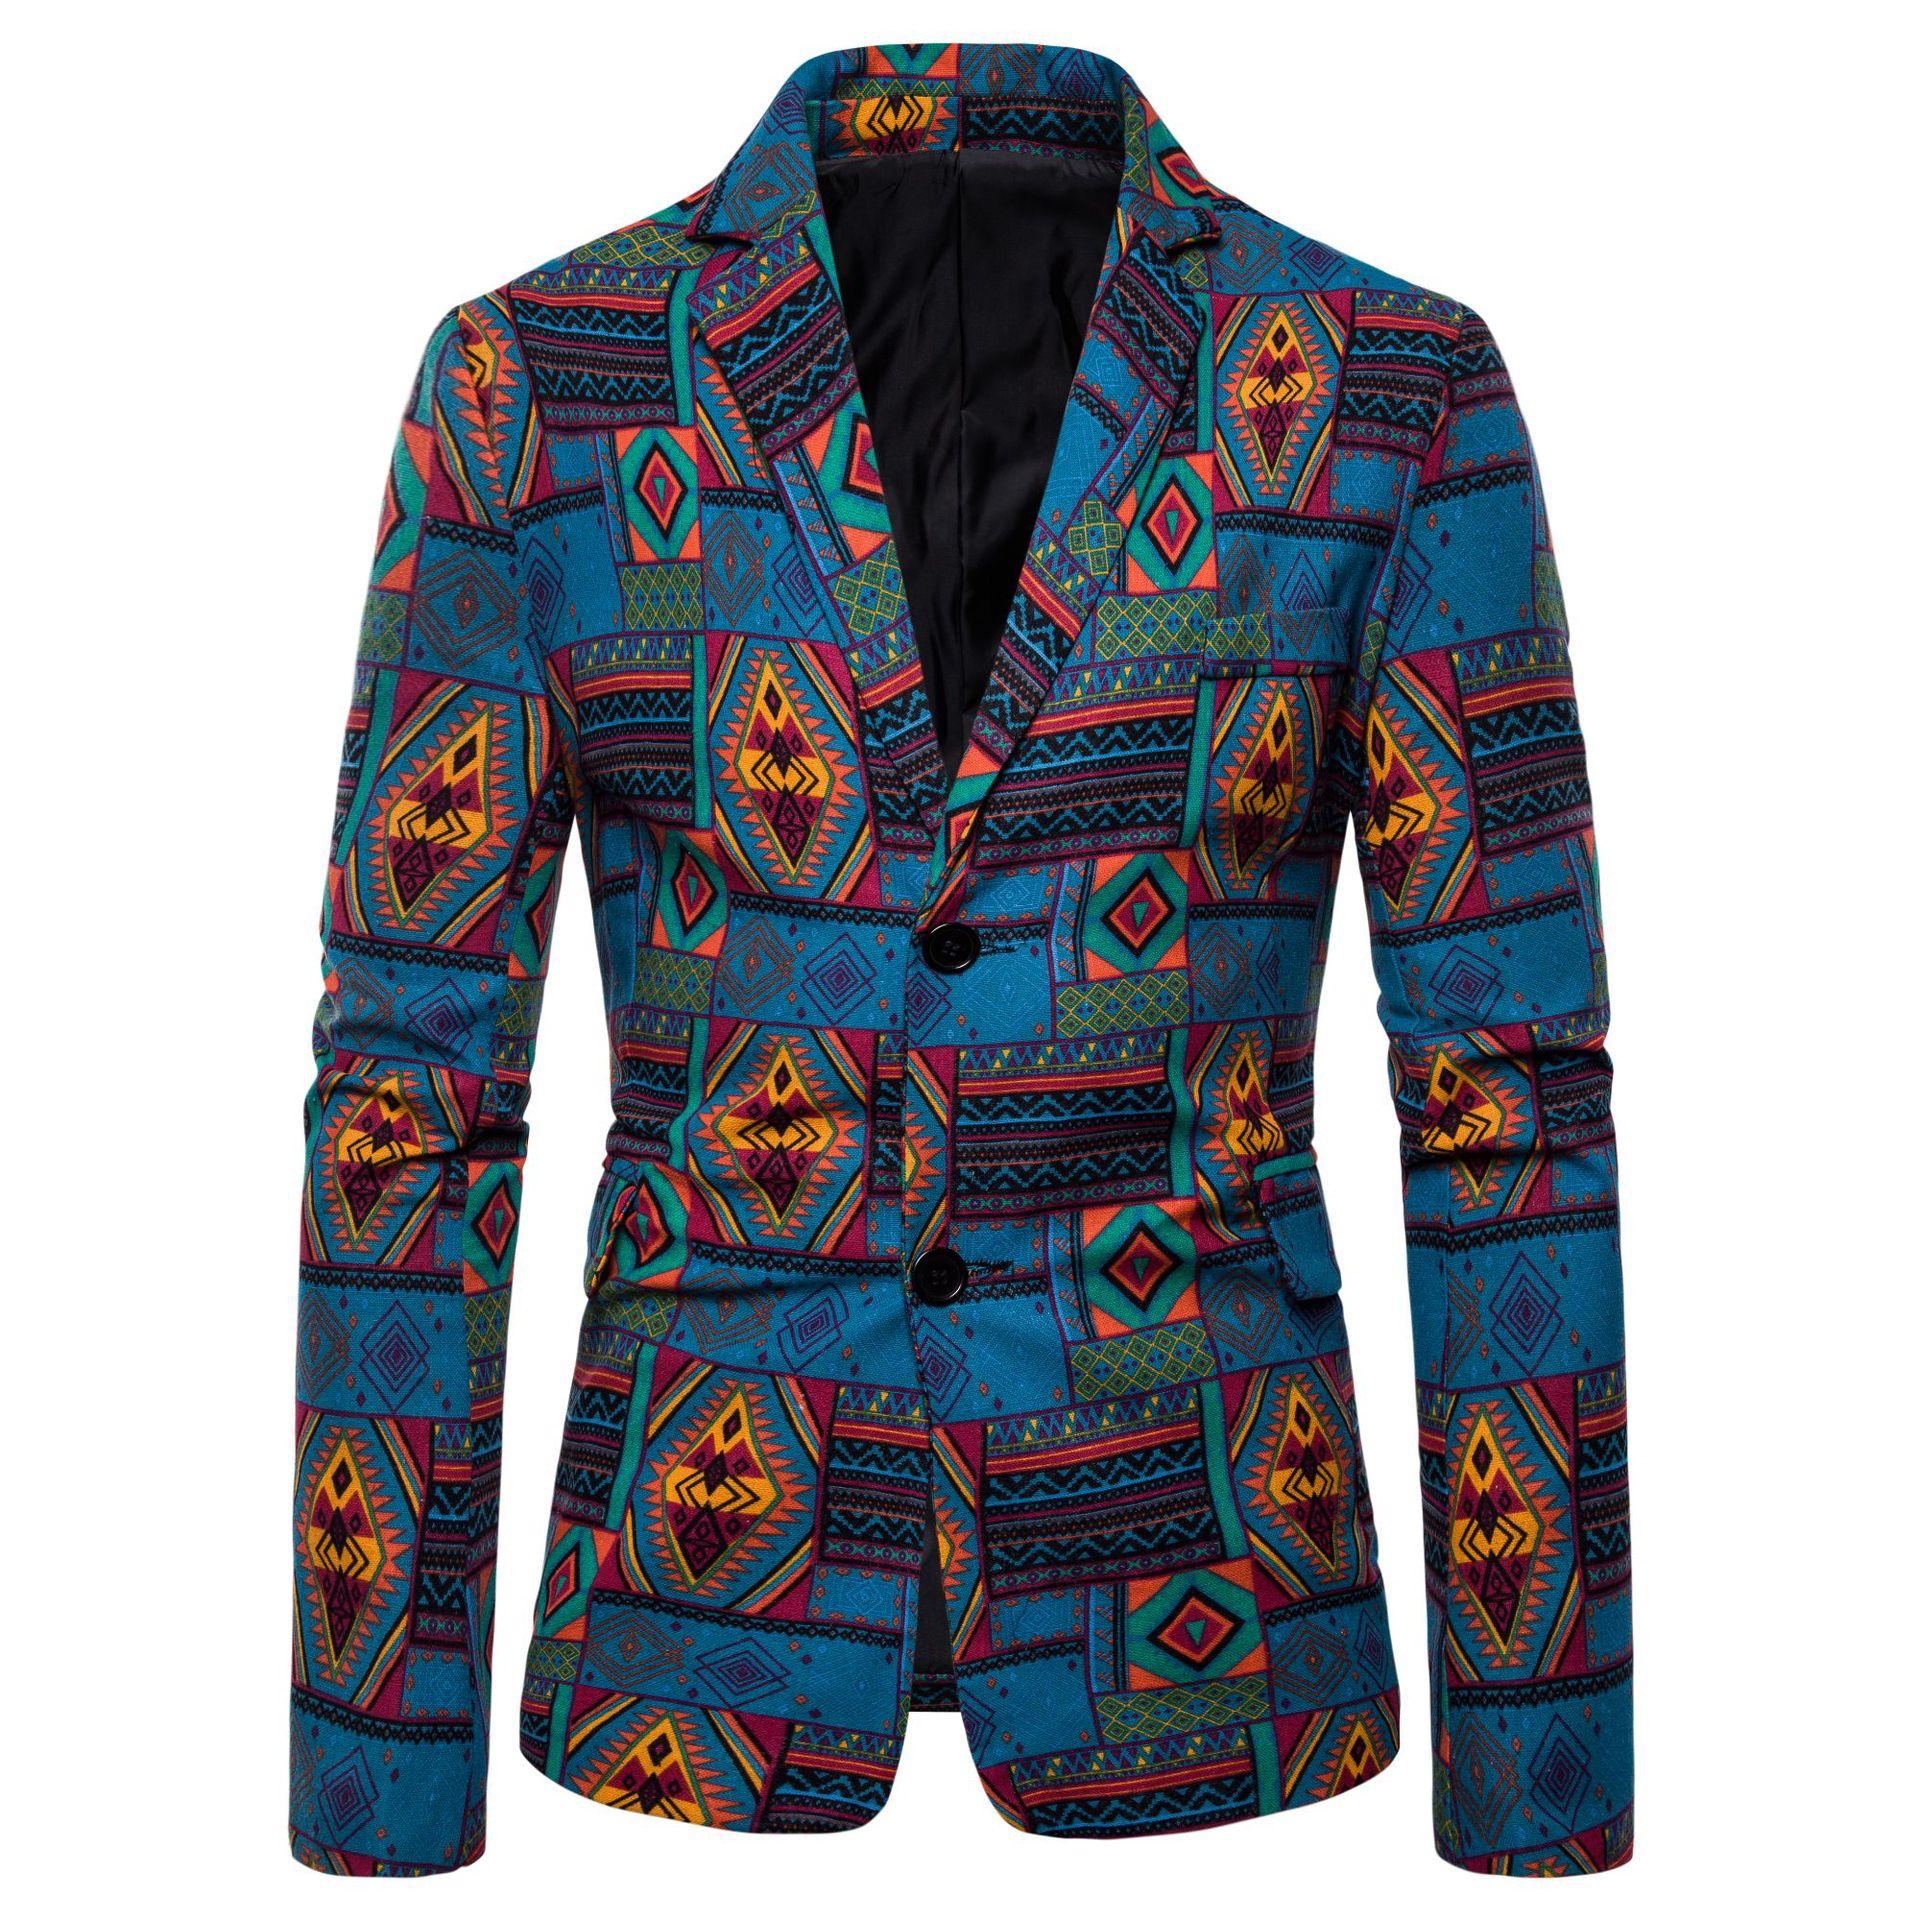 Oeak Men Fashion Casual Suit Jackets Ethnic Printed Autumn Winter Blazers Jackets Coats Oversize 4XL Men Floral Printed Outwear